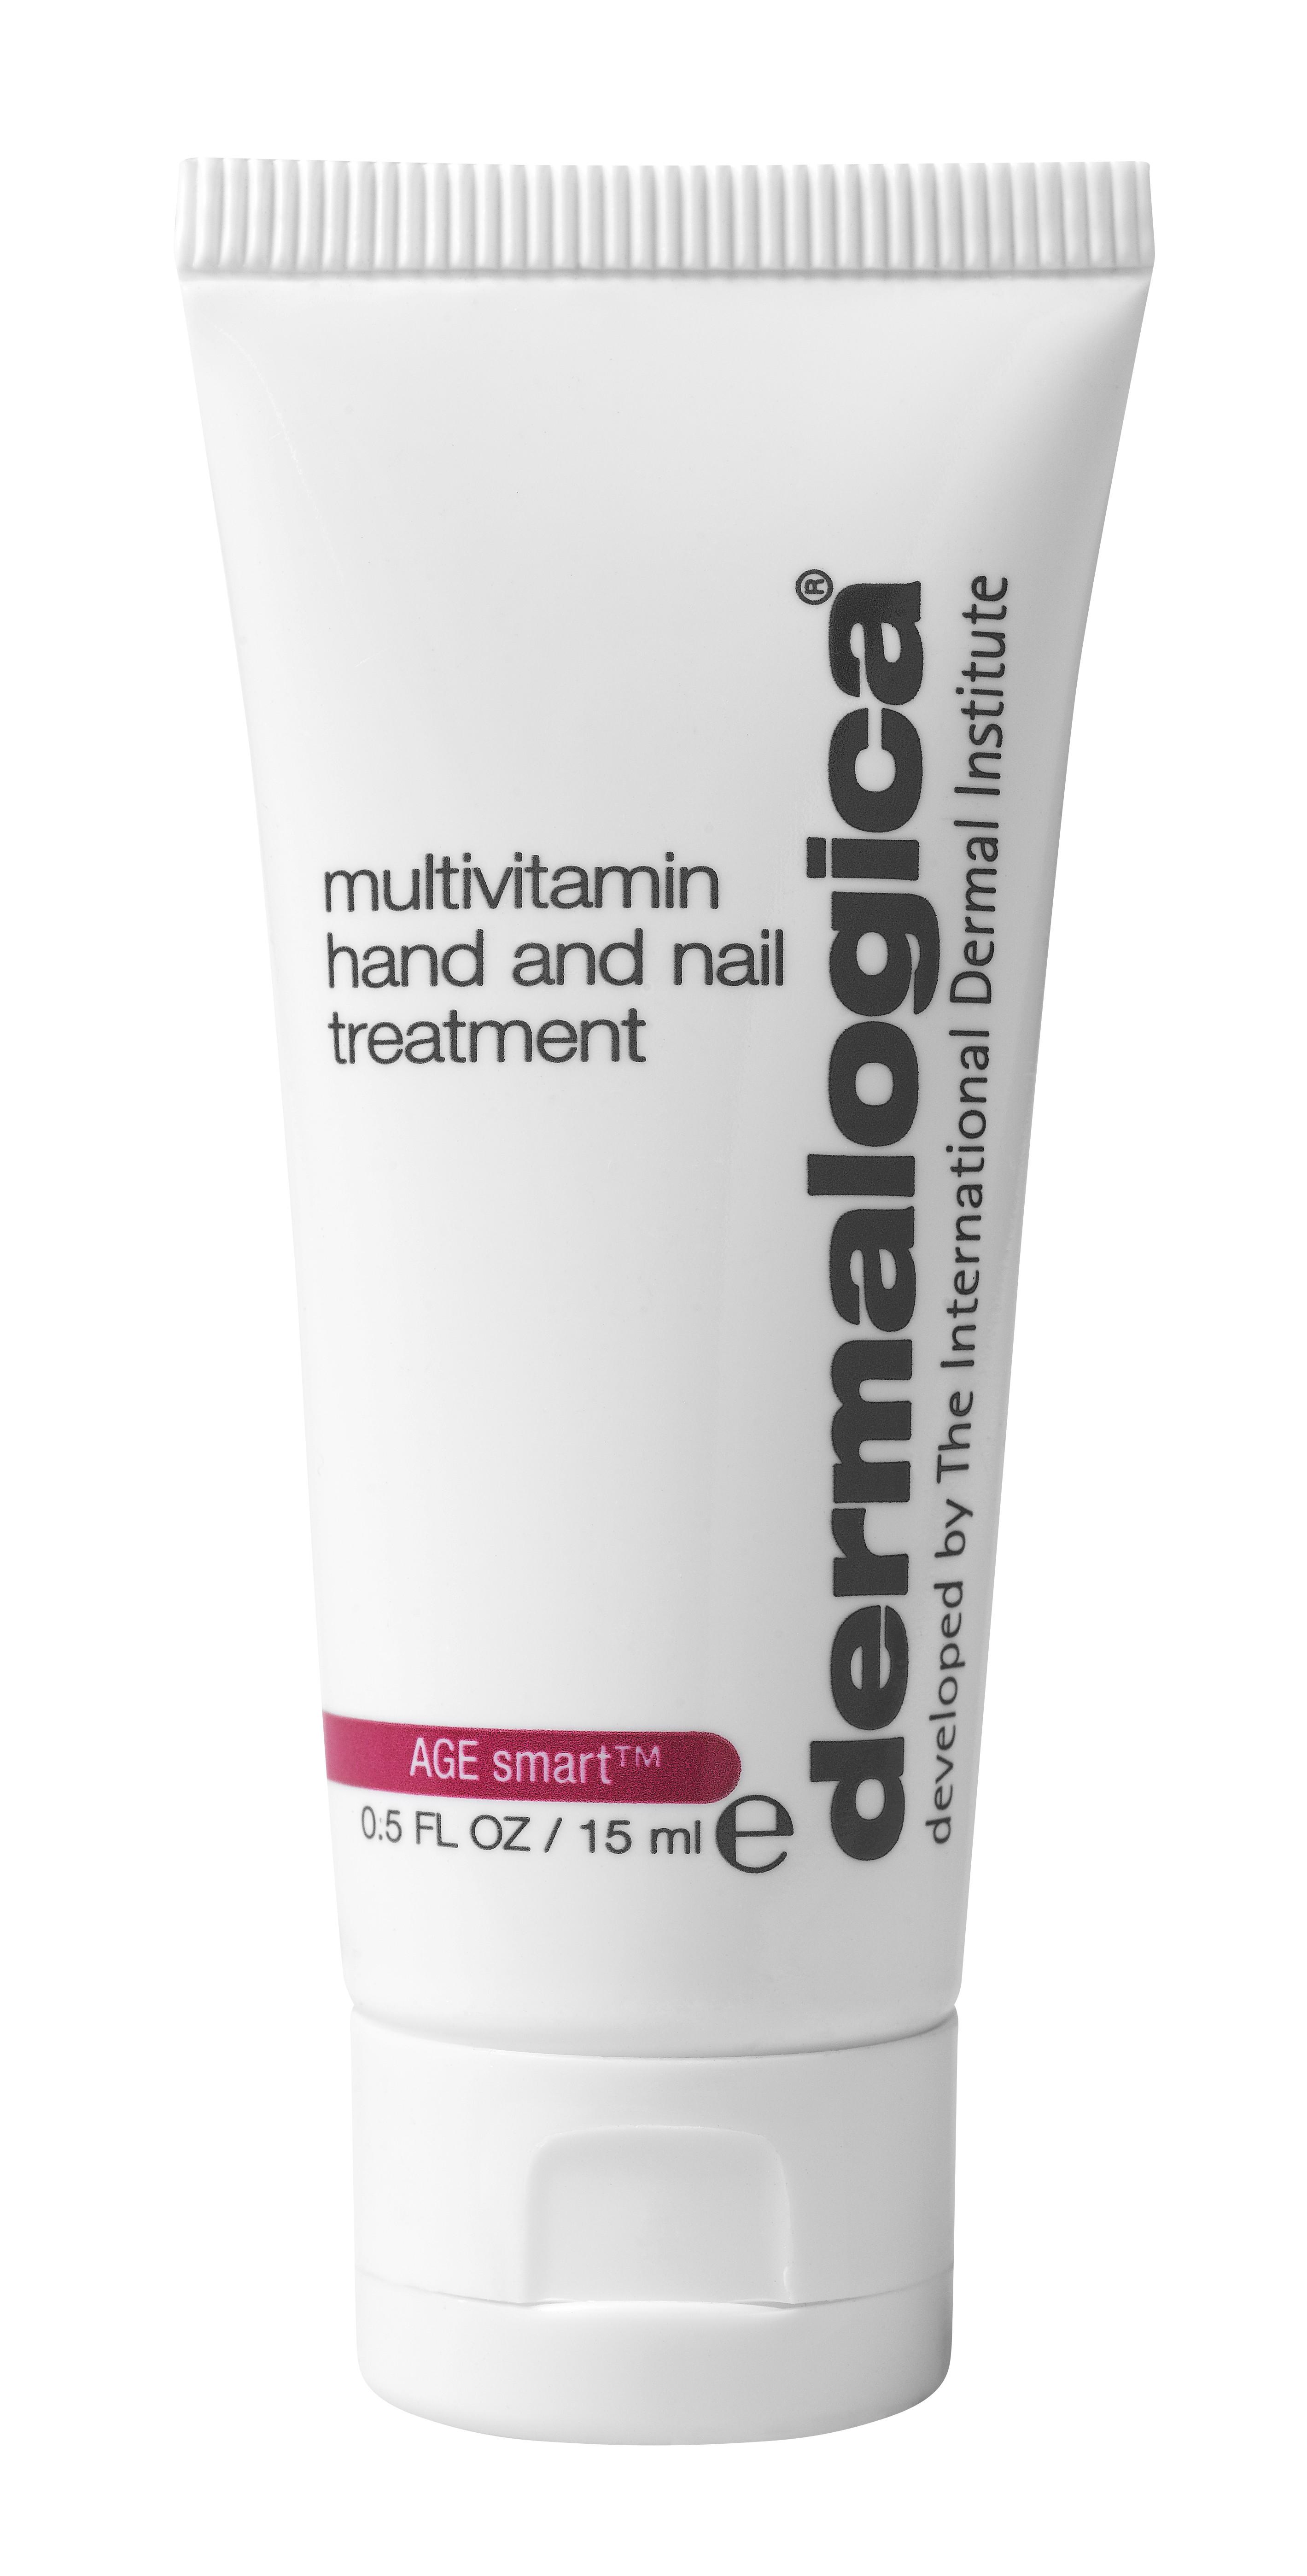 DERMALOGICA Уход мультивитаминный для рук и ногтей / MV Hand & Nail Treatment 15мл